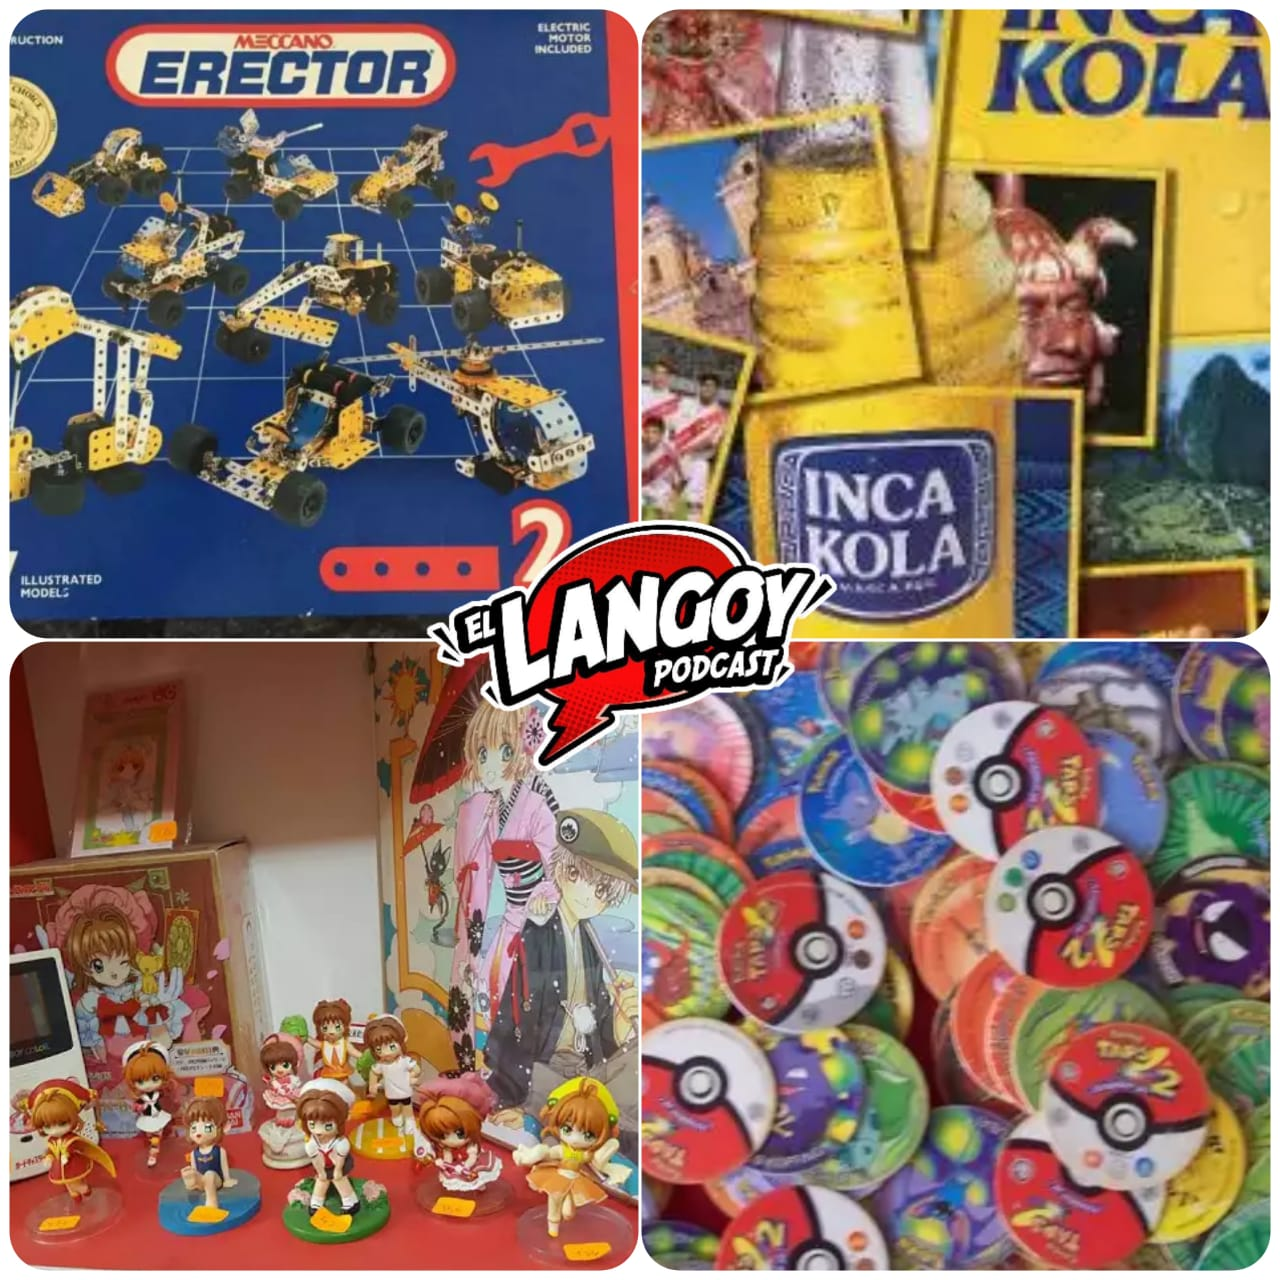 Podcast Langoy Lima Entretenimiento Colecciones